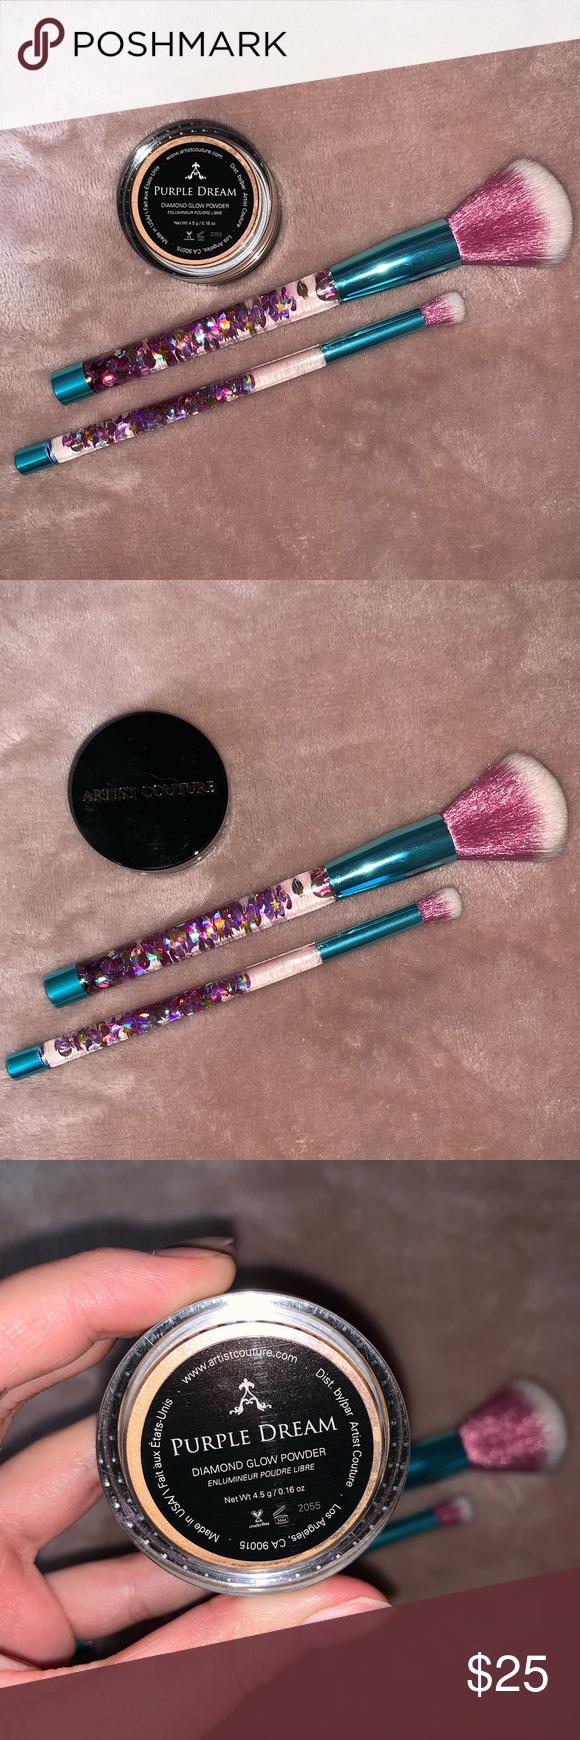 Artist Couture Diamond Glow Powder Purple Dream NWT in